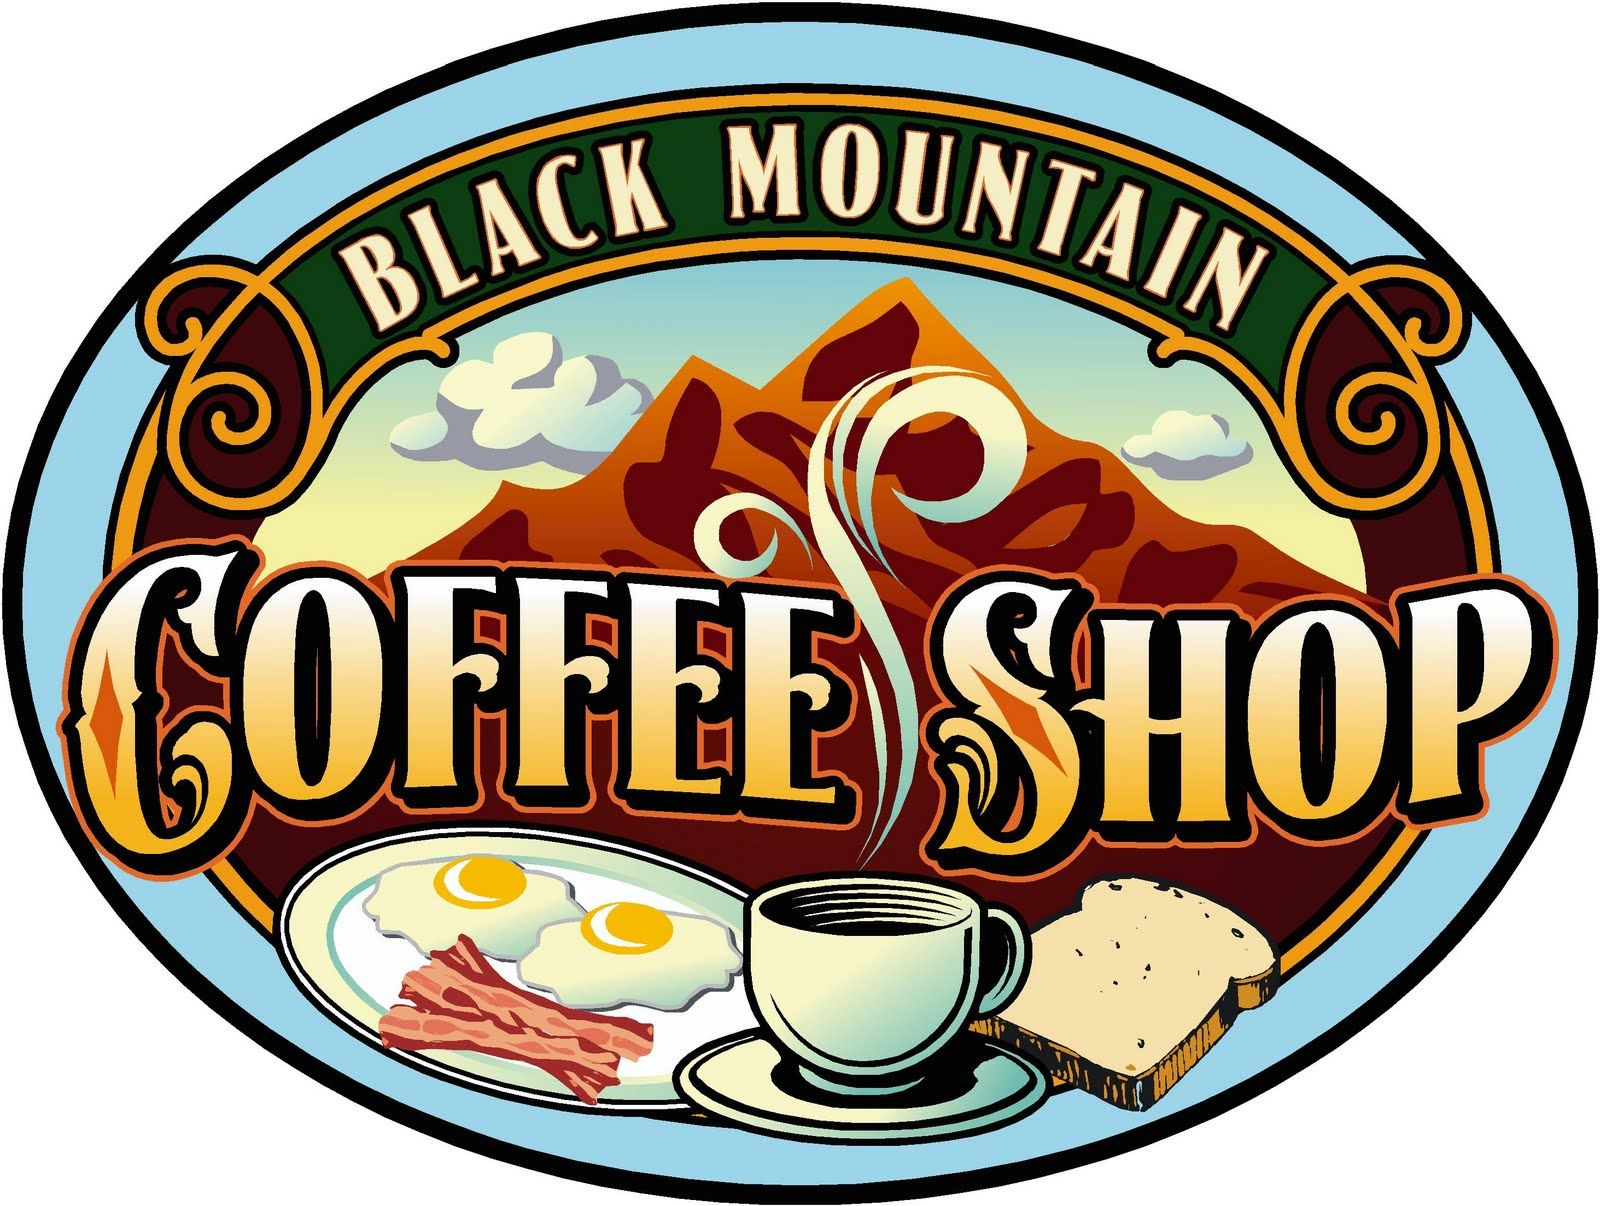 Art logo logo s coffee logo coffee shop coffee design shop logo coffee - Bertram Signs Creates New Logo And Signs For Black Mountain Coffee Shop In Carefree Arizona